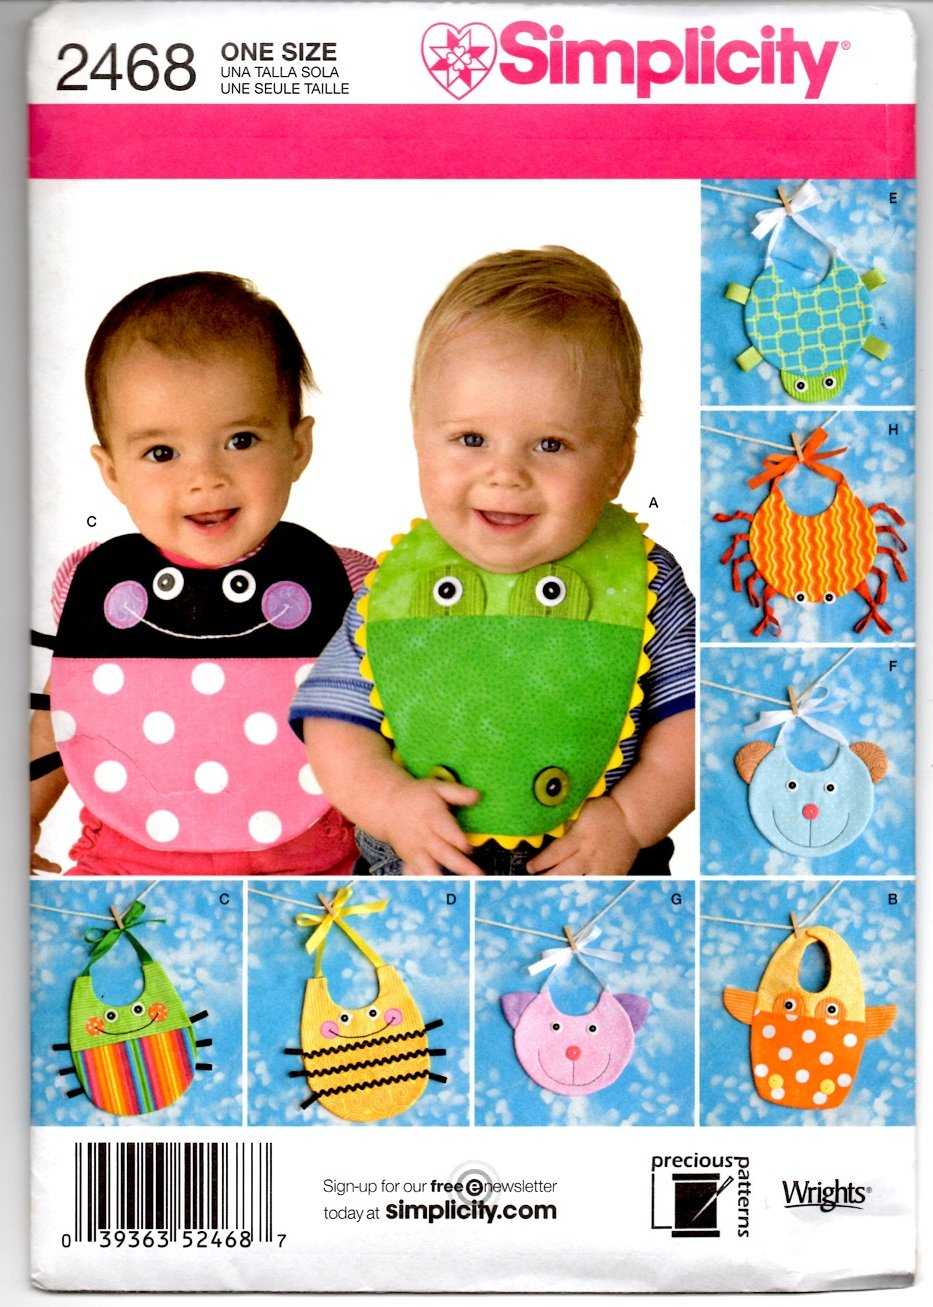 Simplicity 2468 Baby Bib Patterns - Uncut